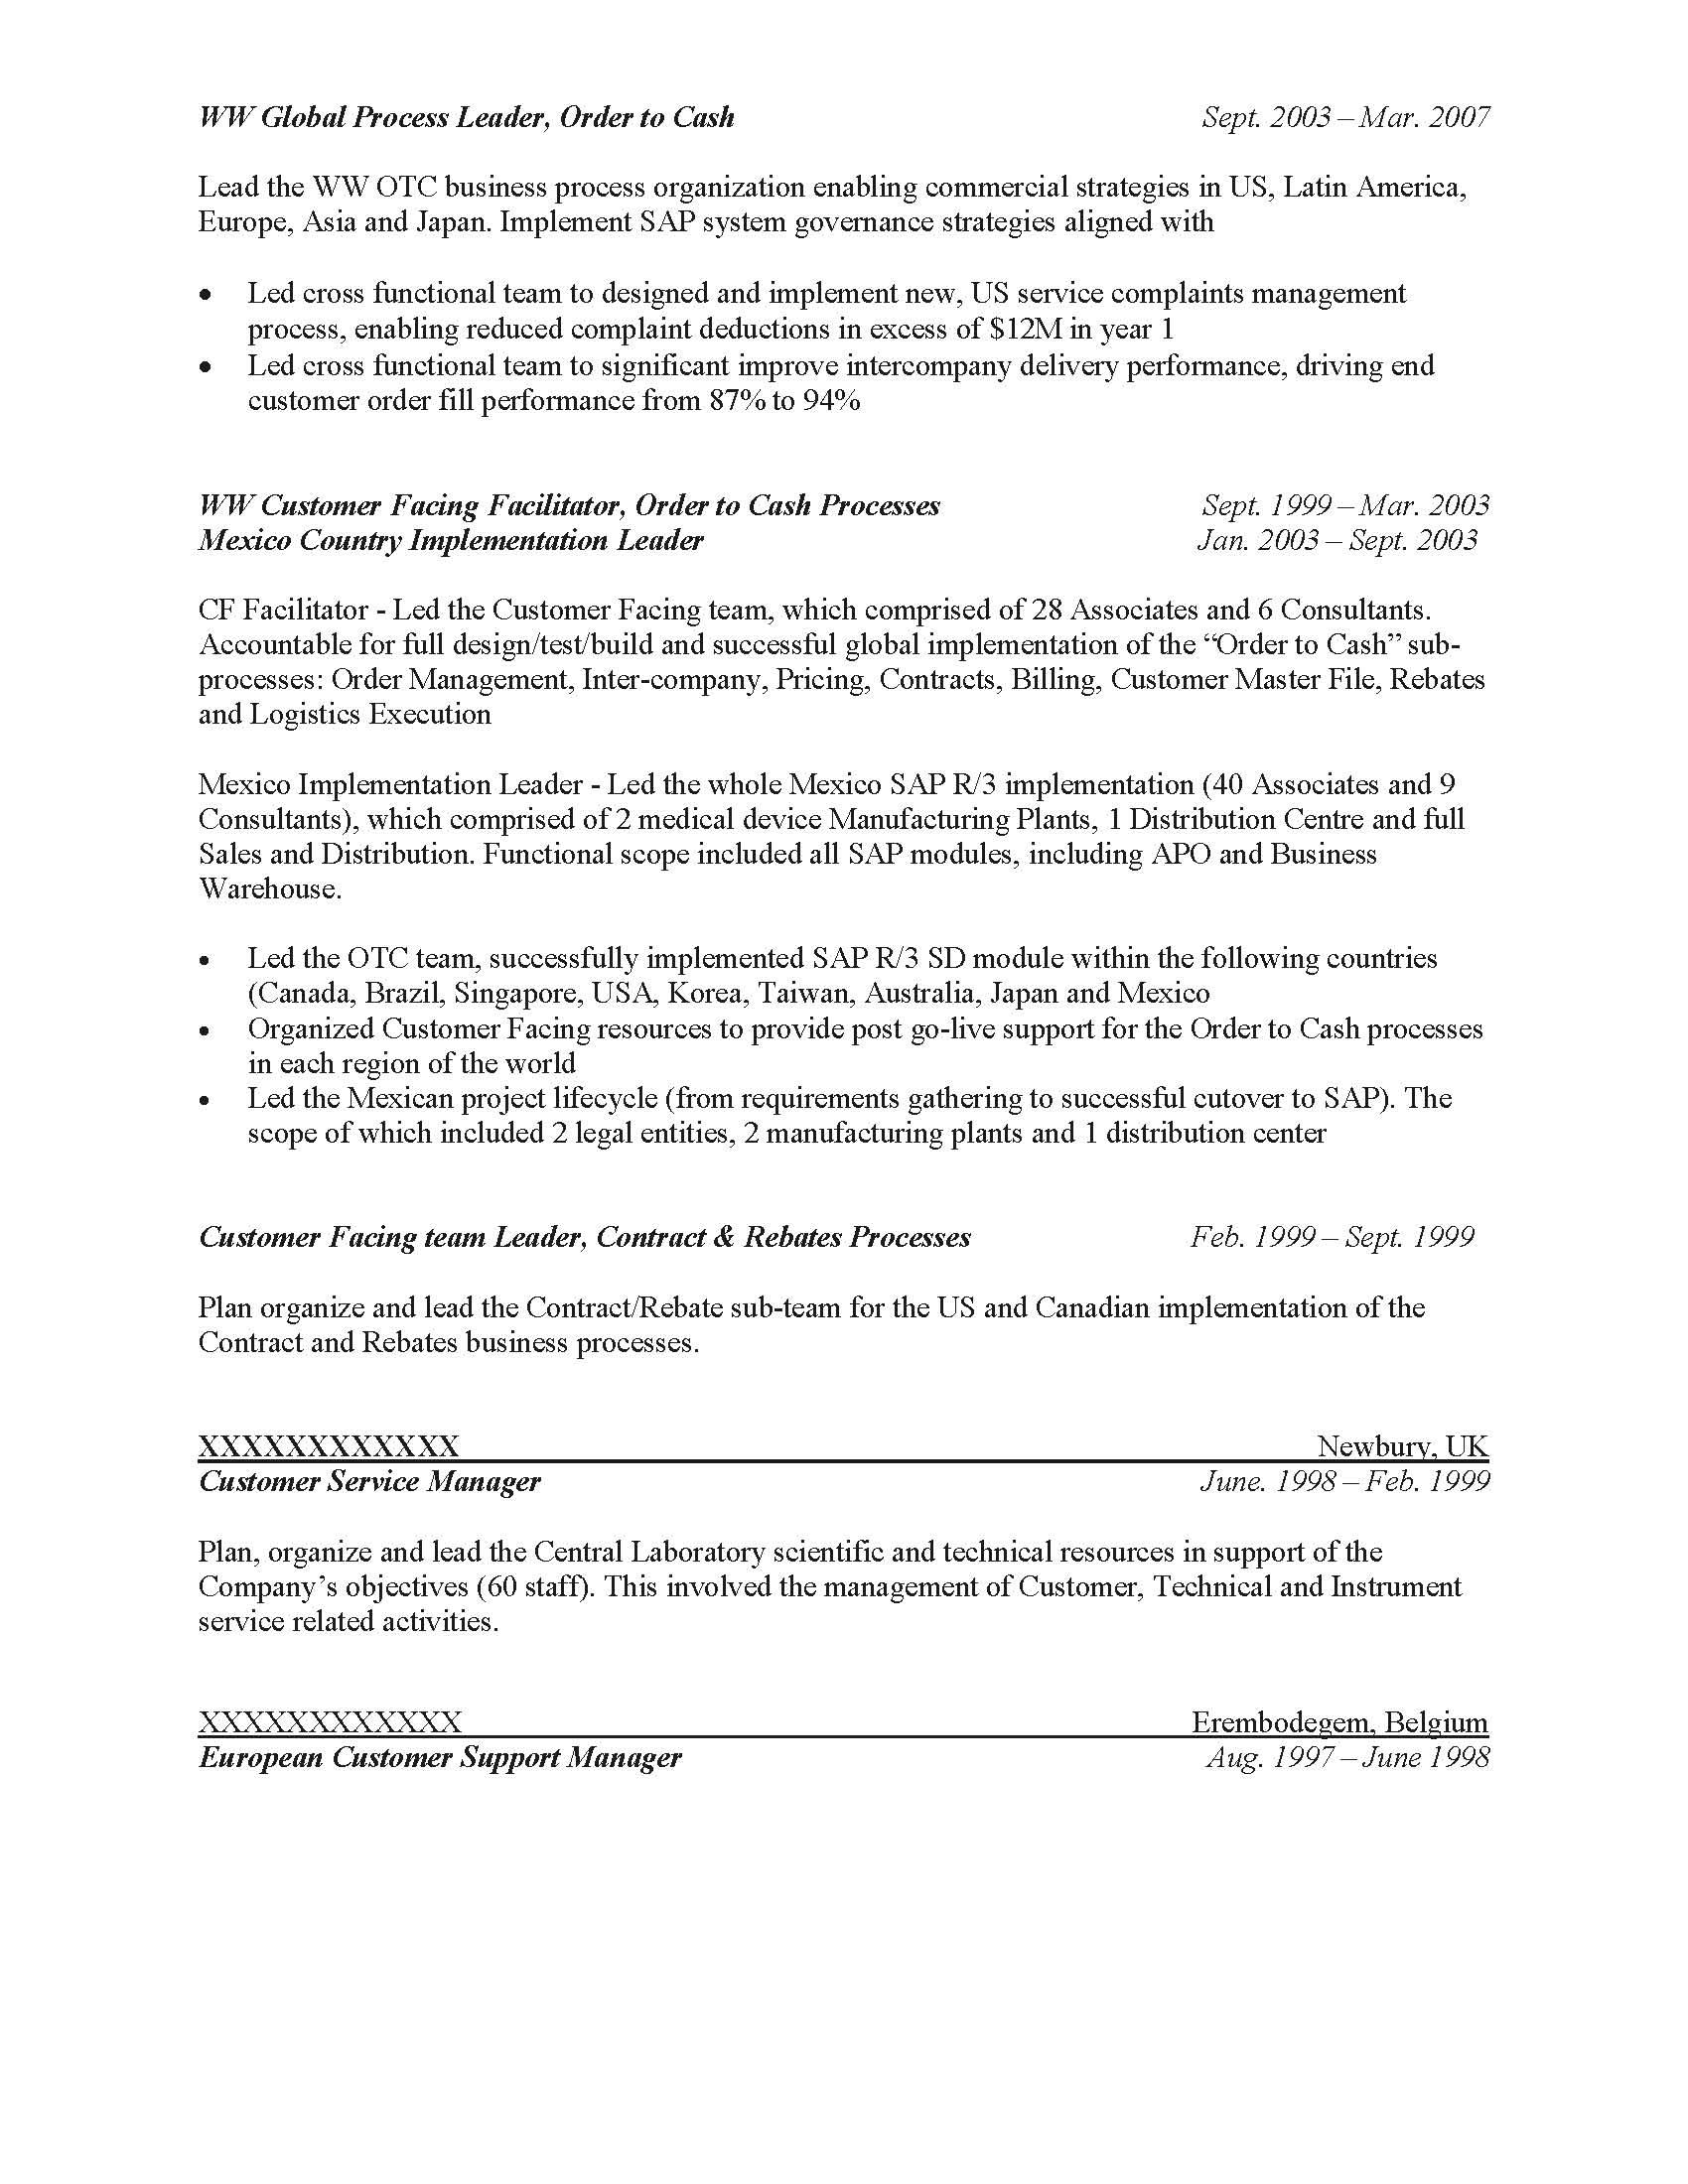 Business Process Leader Resume Sample